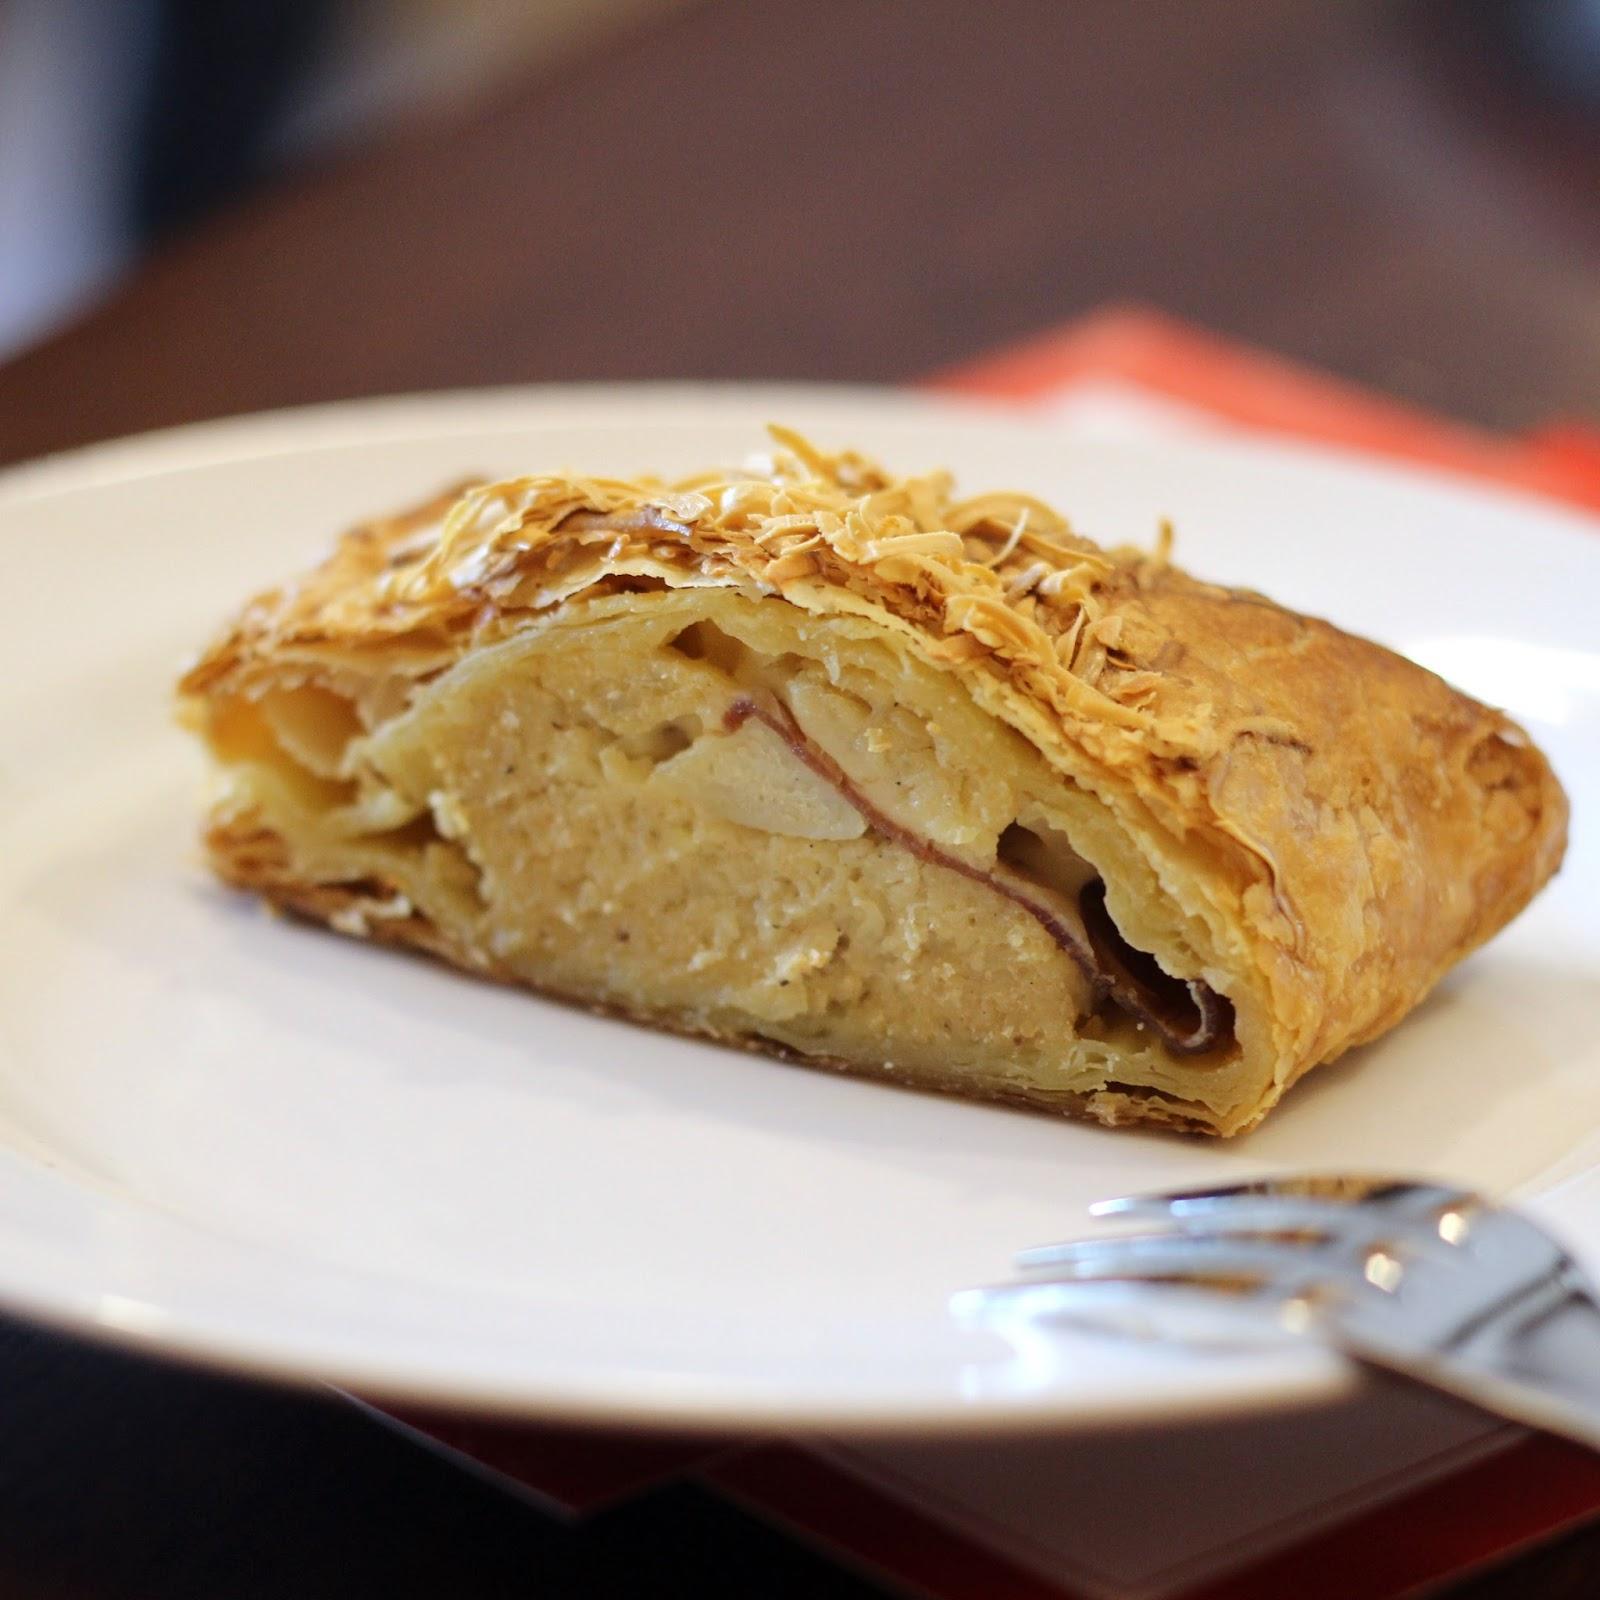 Harga Whole Cake Pandor